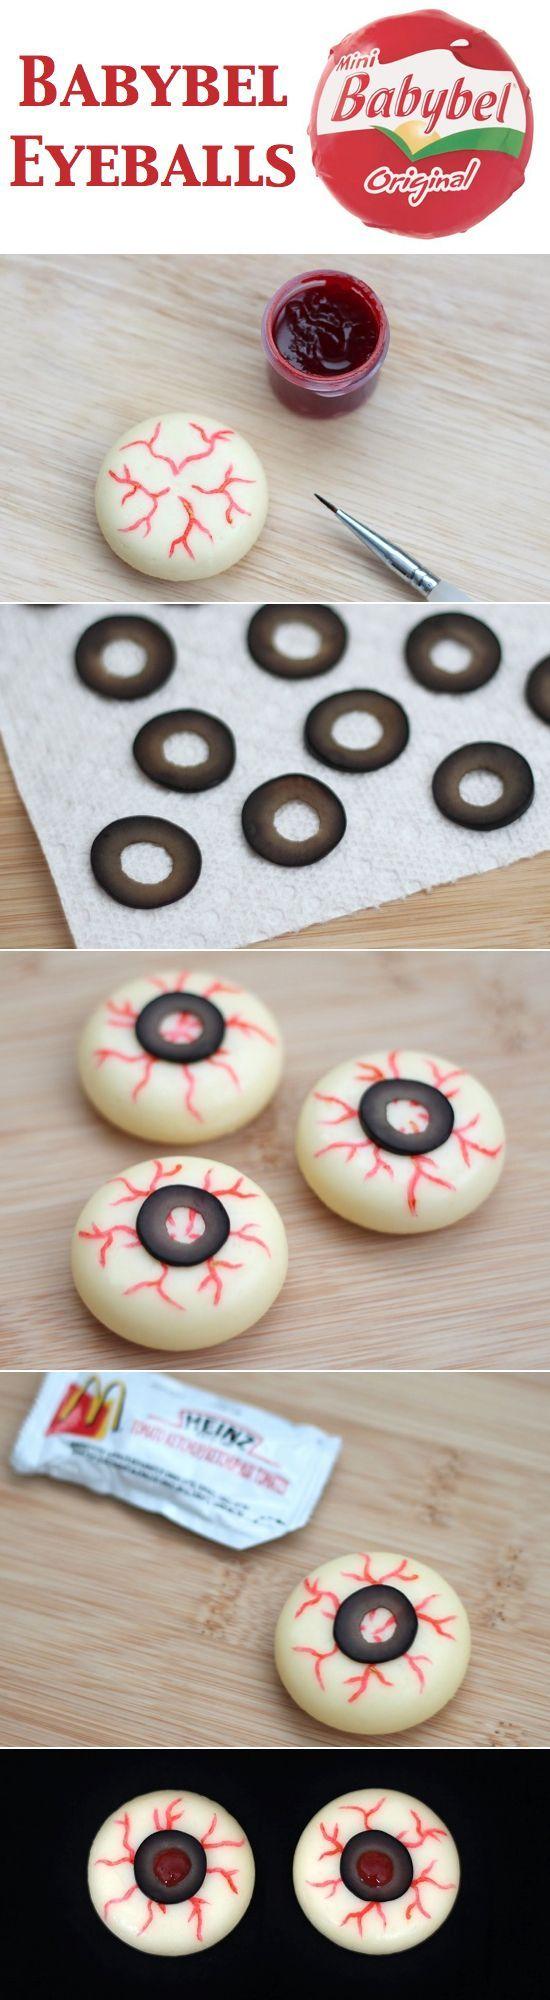 Easy Halloween Eyeball | http://doityourselfcollections.blogspot.com